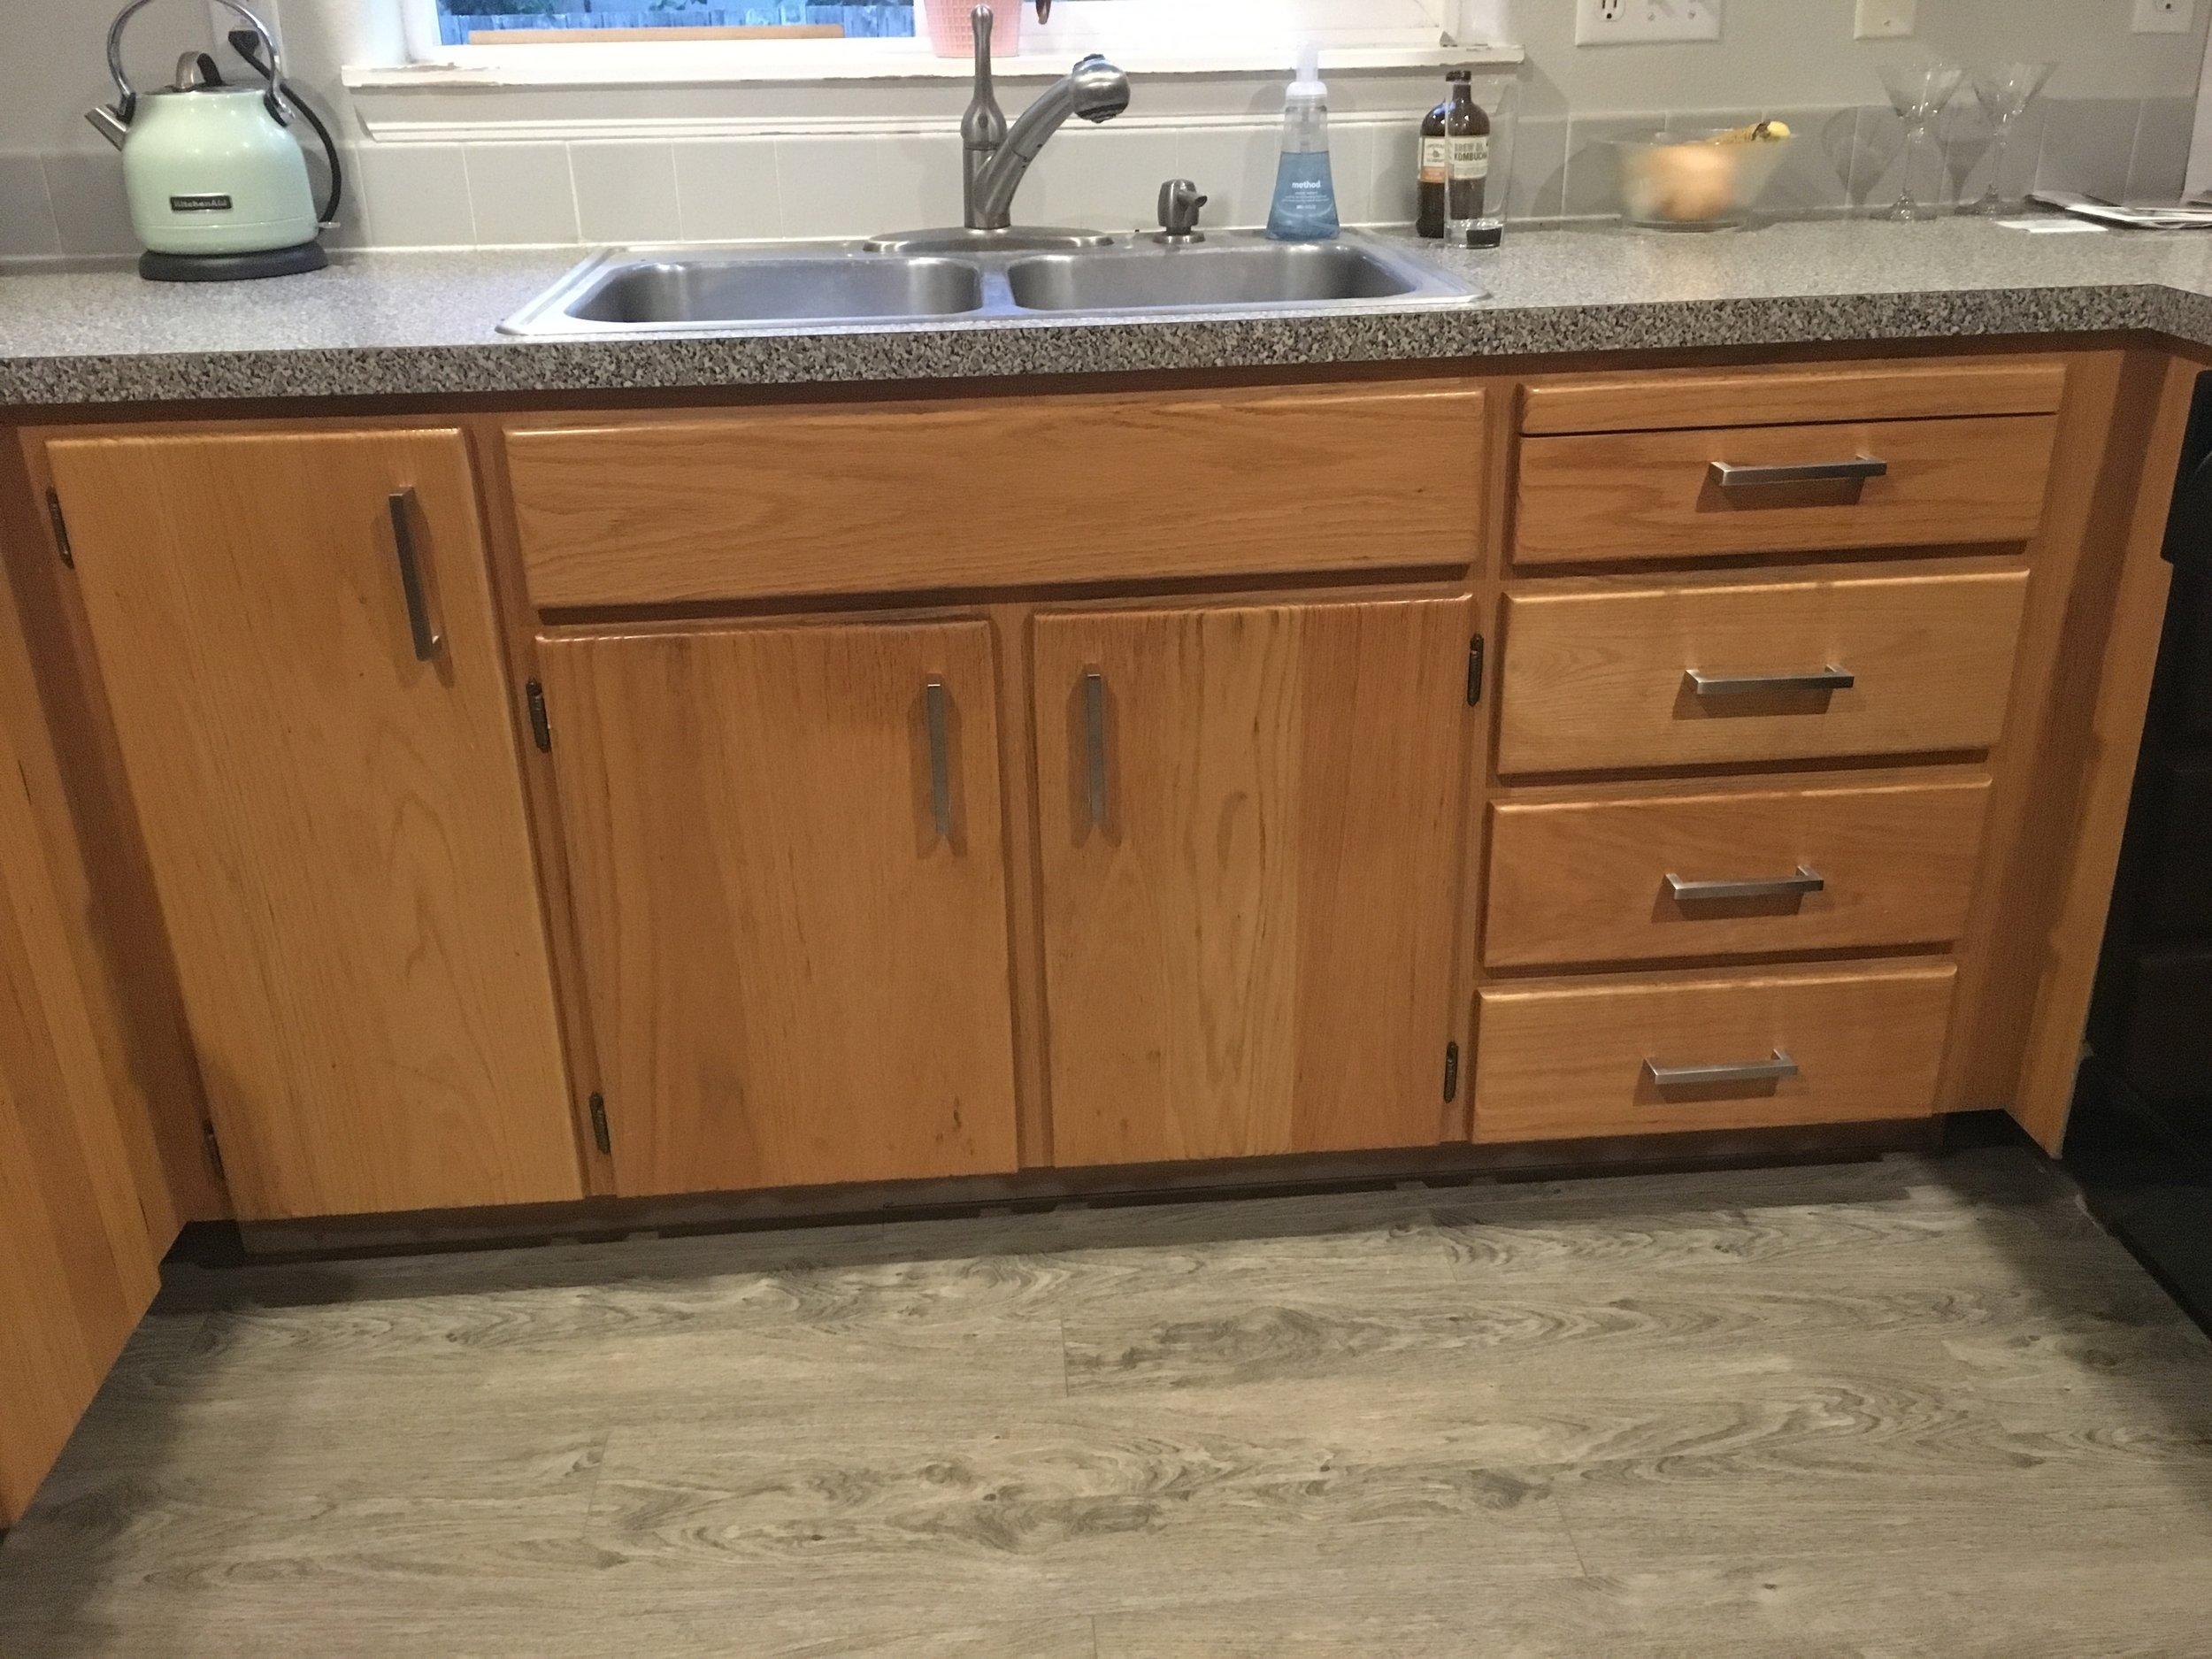 Added modern drawer pulls